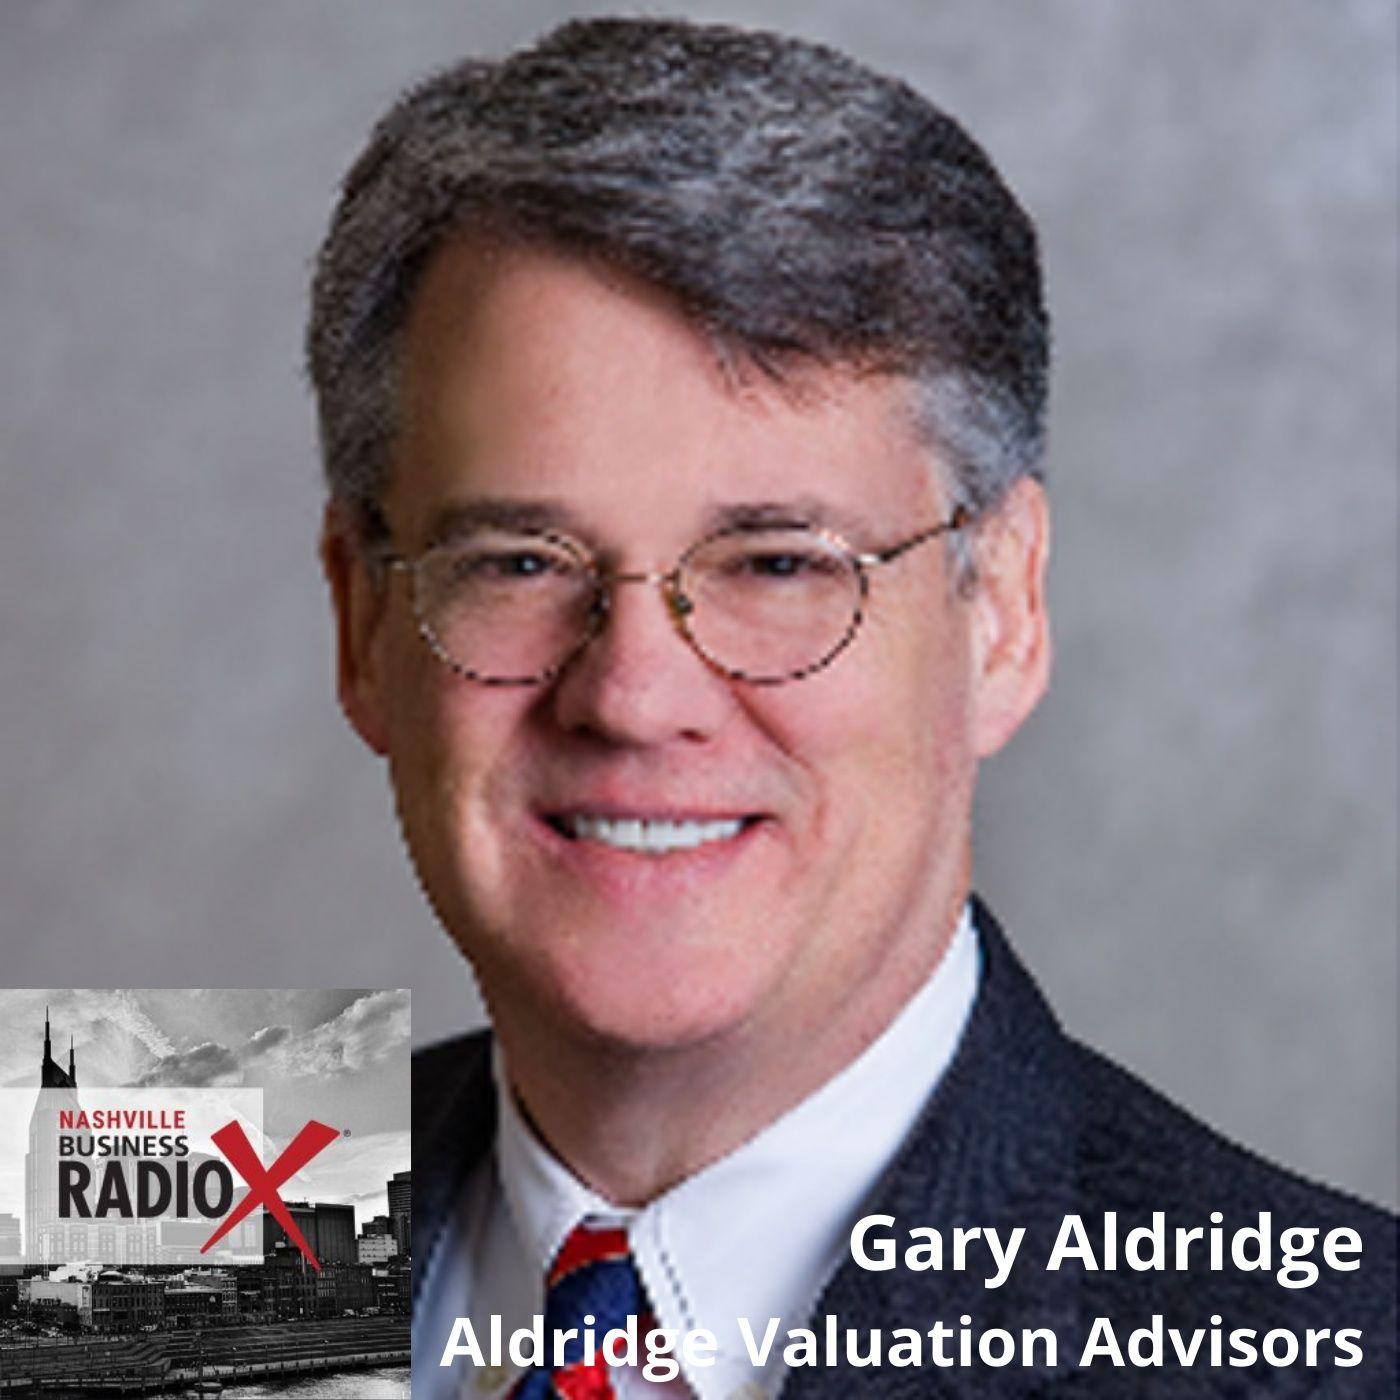 Gary Aldridge, Aldridge Valuation Advisors